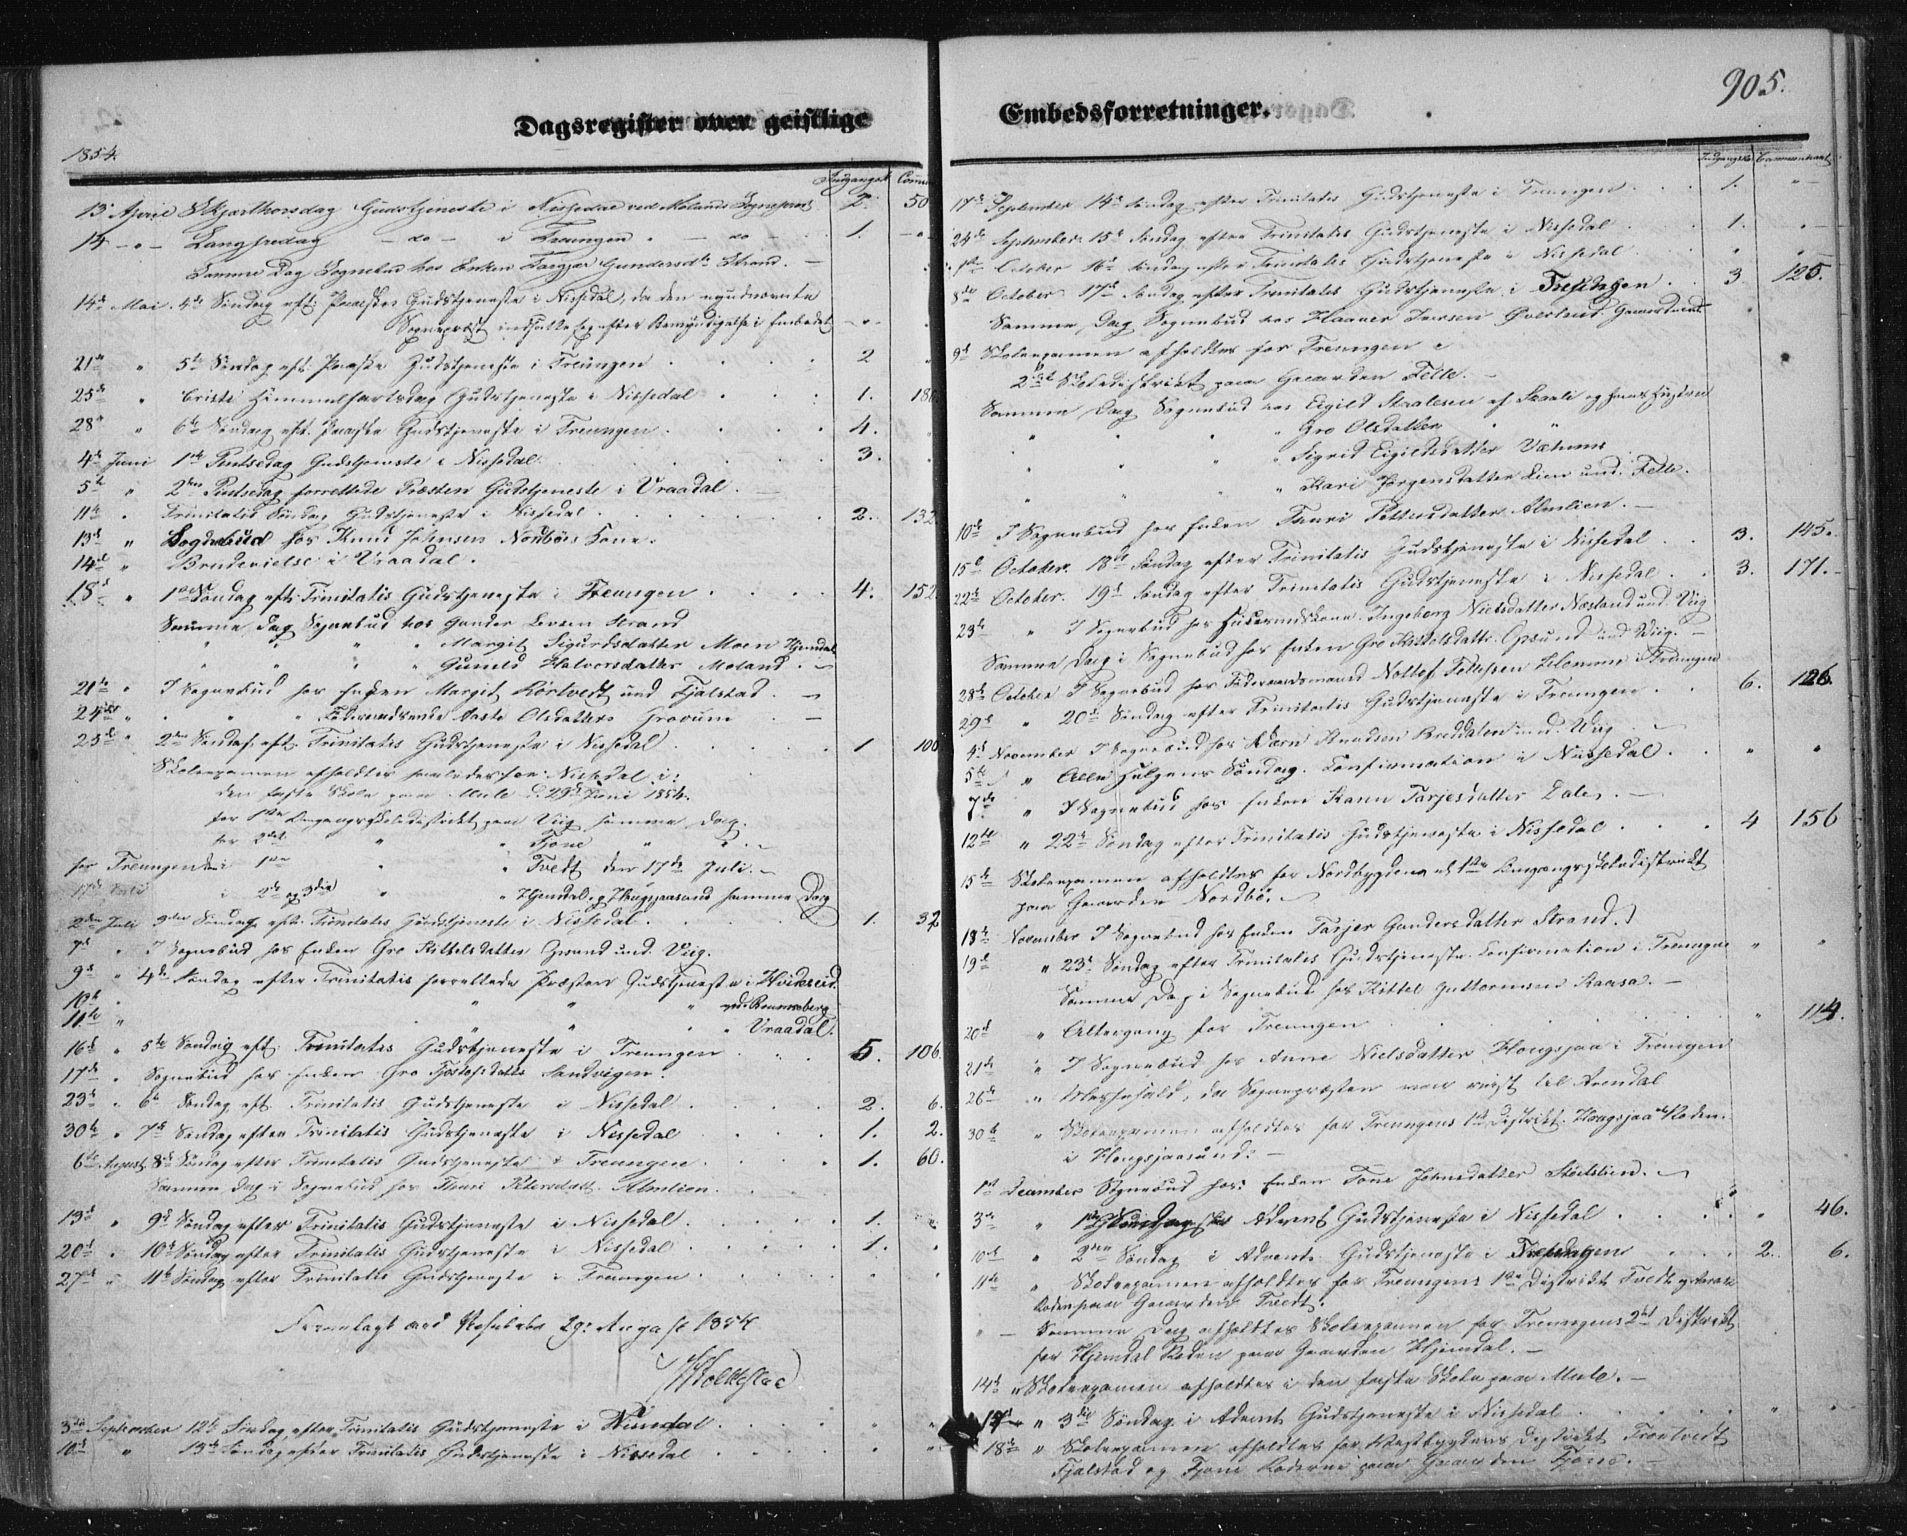 SAKO, Nissedal kirkebøker, F/Fa/L0003: Ministerialbok nr. I 3, 1846-1870, s. 904-905